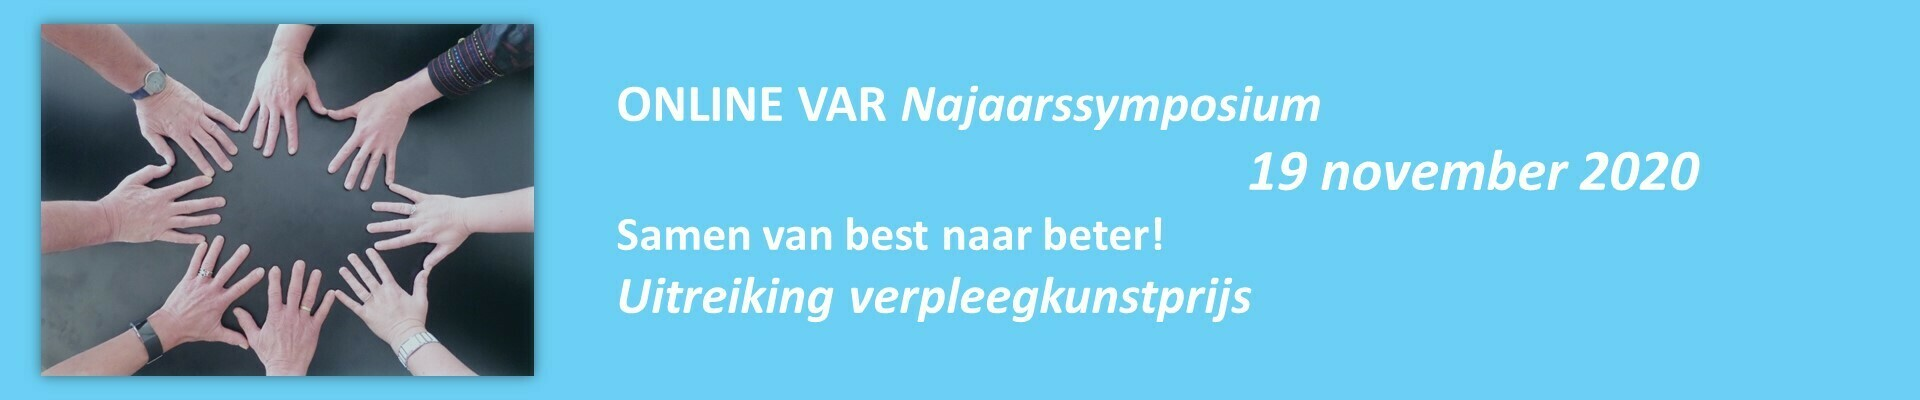 Online VAR Najaarssymposium 19 november 2020